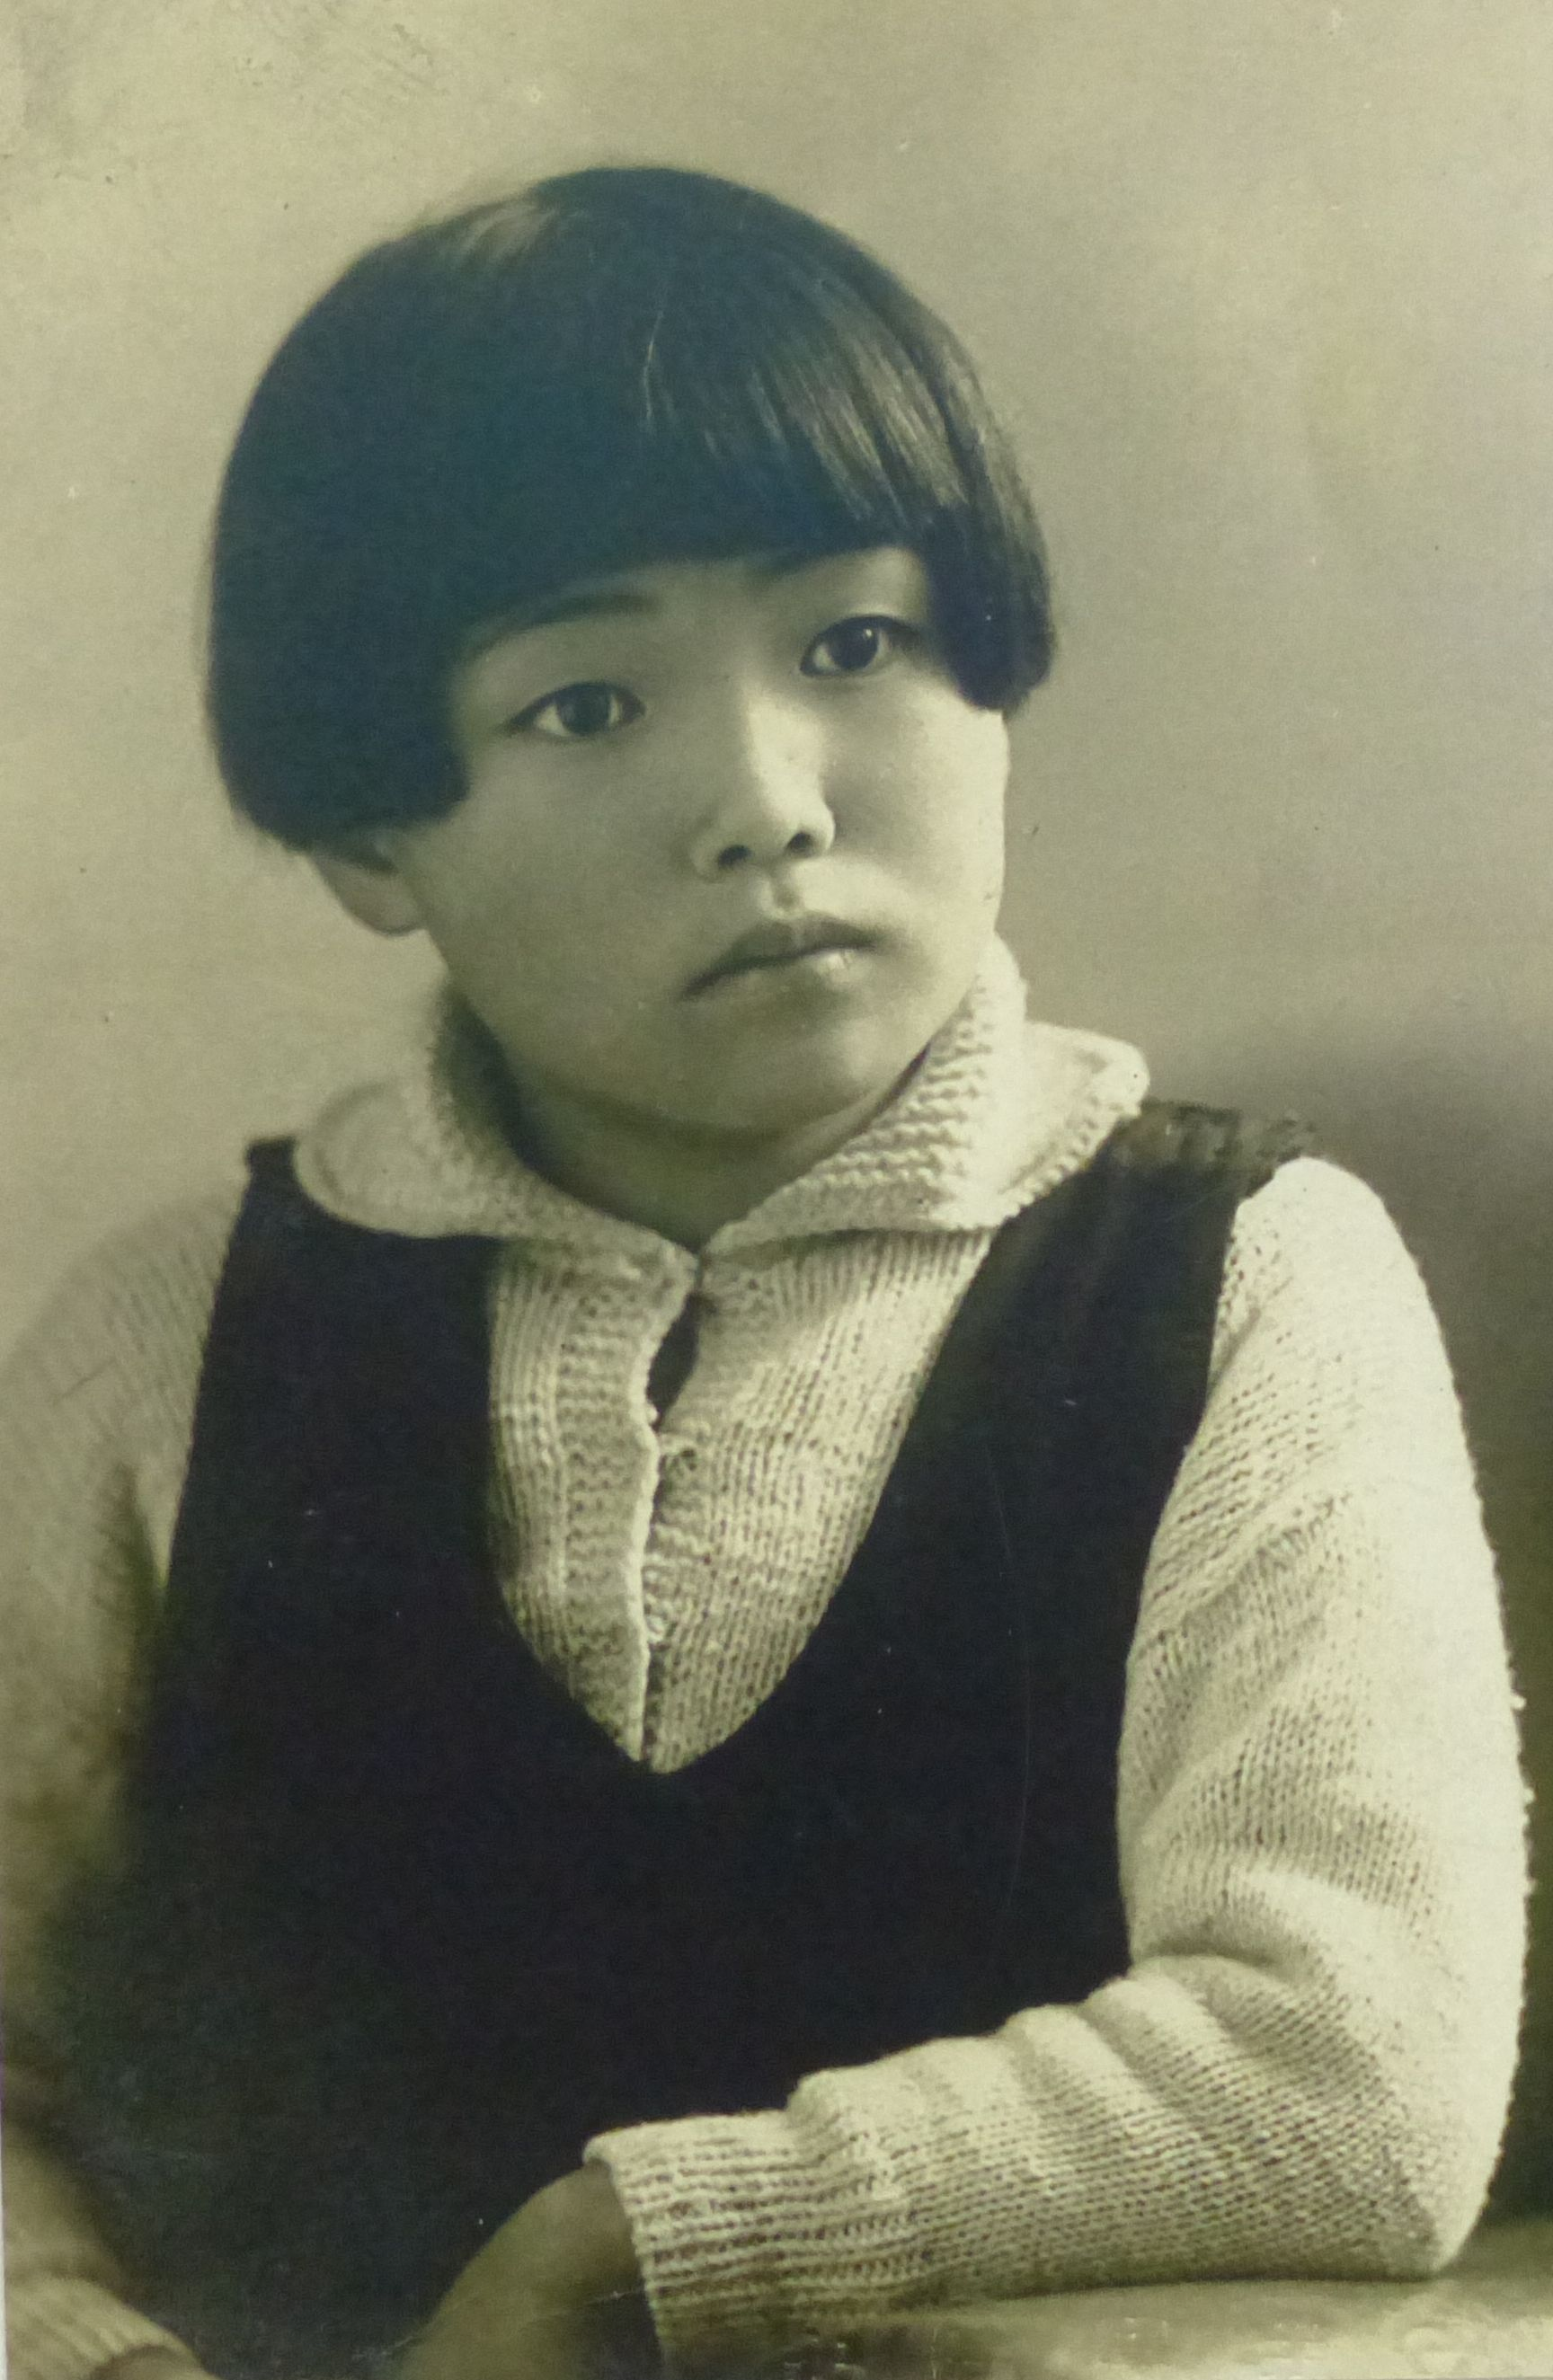 [Exposição: Obsessão Infinita] Yayoi Kusama, 1936